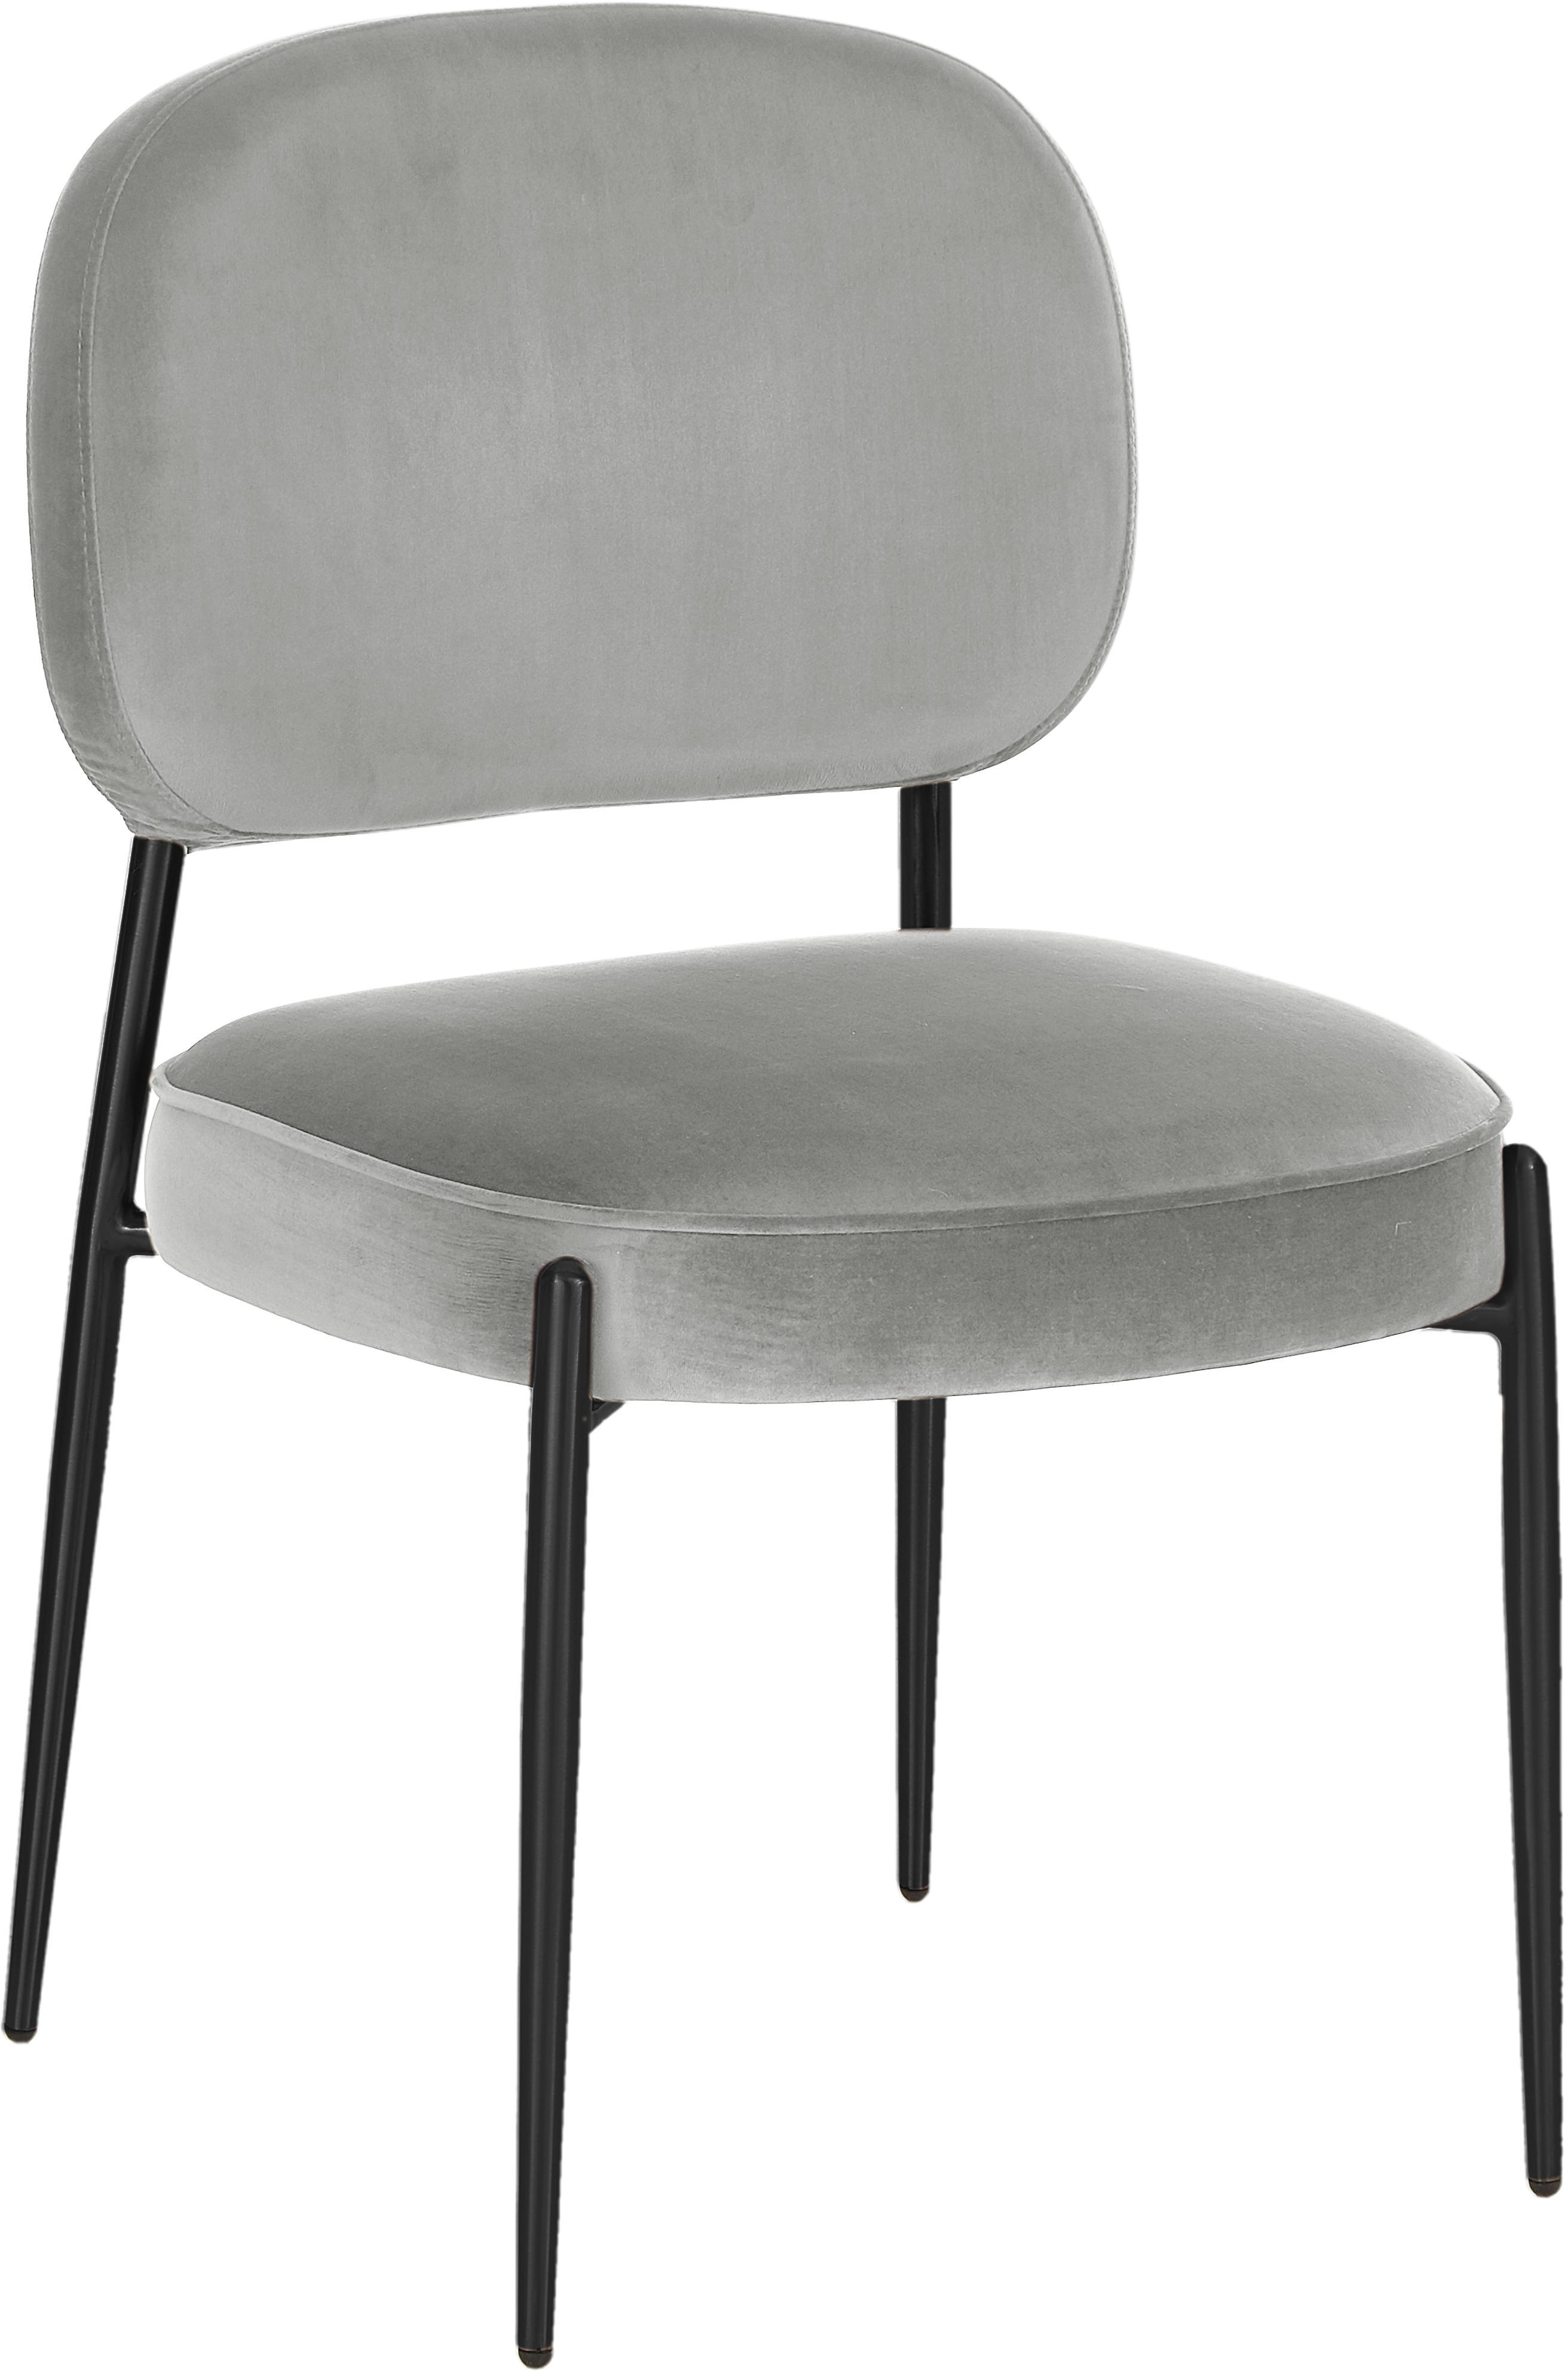 Sedia imbottita in velluto Viggo, Rivestimento: velluto (poliestere) 50.0, Velluto grigio, gambe nero, Larg. 49 x Alt. 66 cm